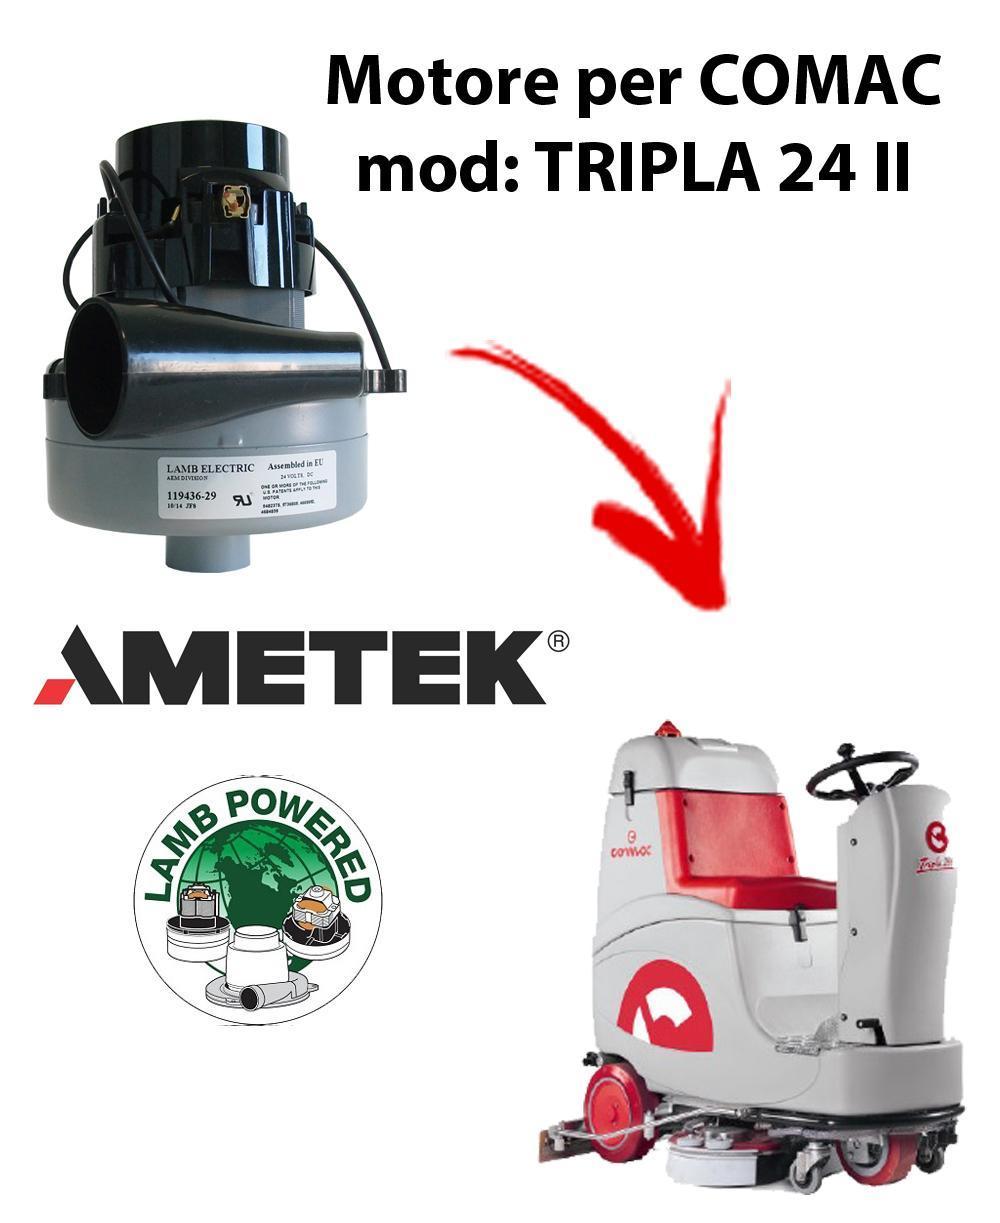 TRIPLA 24 II Ametek Vacuum Motor for scrubber dryer Comac